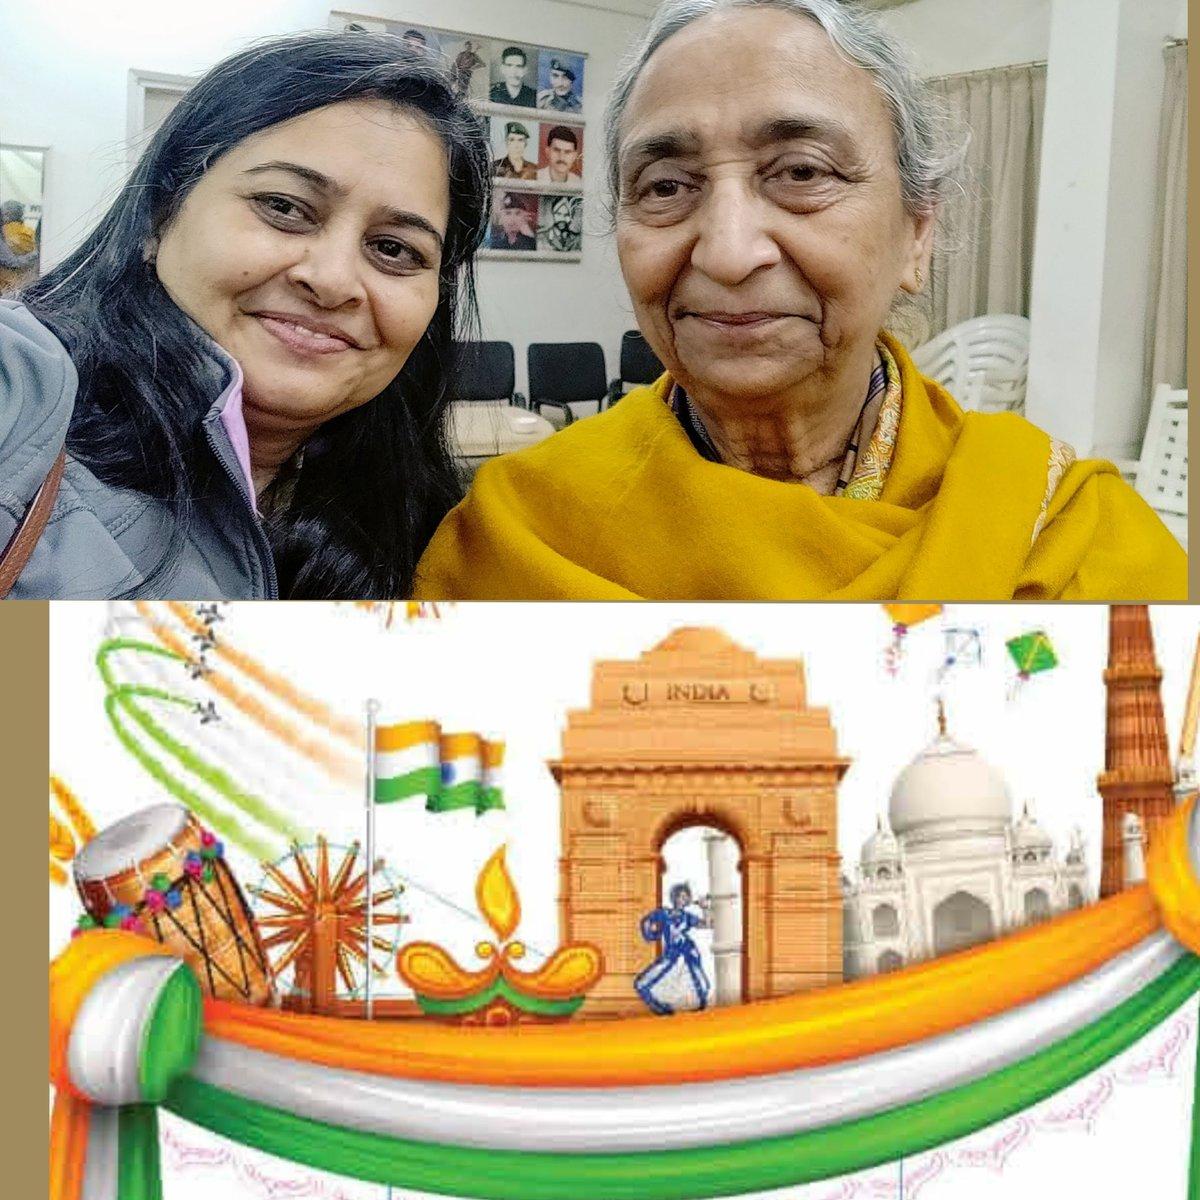 Arjuna Awardee & Six times National Badminton Champion Damayanti Mam  Celebrated 50th Republic Day since her husband  FLIGHT LIEUTENANT VIJAY TAMBAY 32 SQUADRON IAF went missing in action in Dec 1971  #Missing54 #KnowYourHeroes @manhasvikas41 #LestWeForget